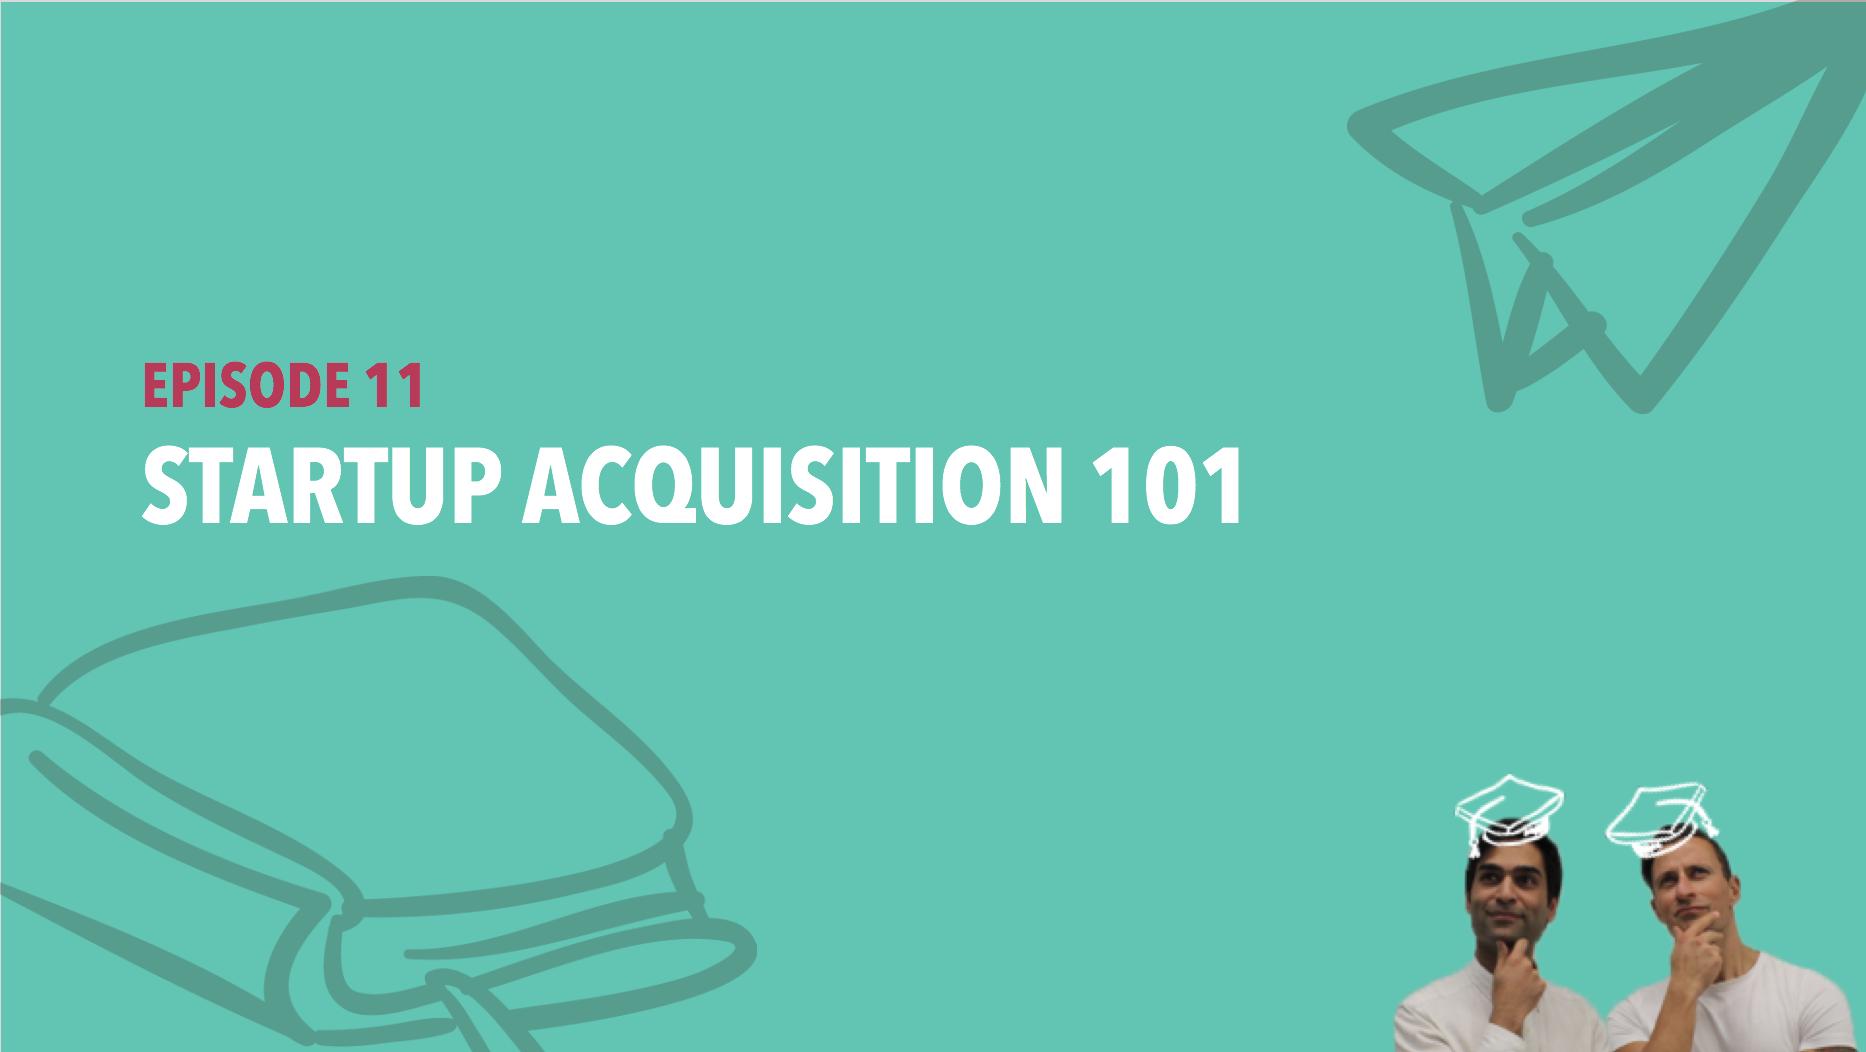 CiSchool Episode #011: Startup Acquisition 101